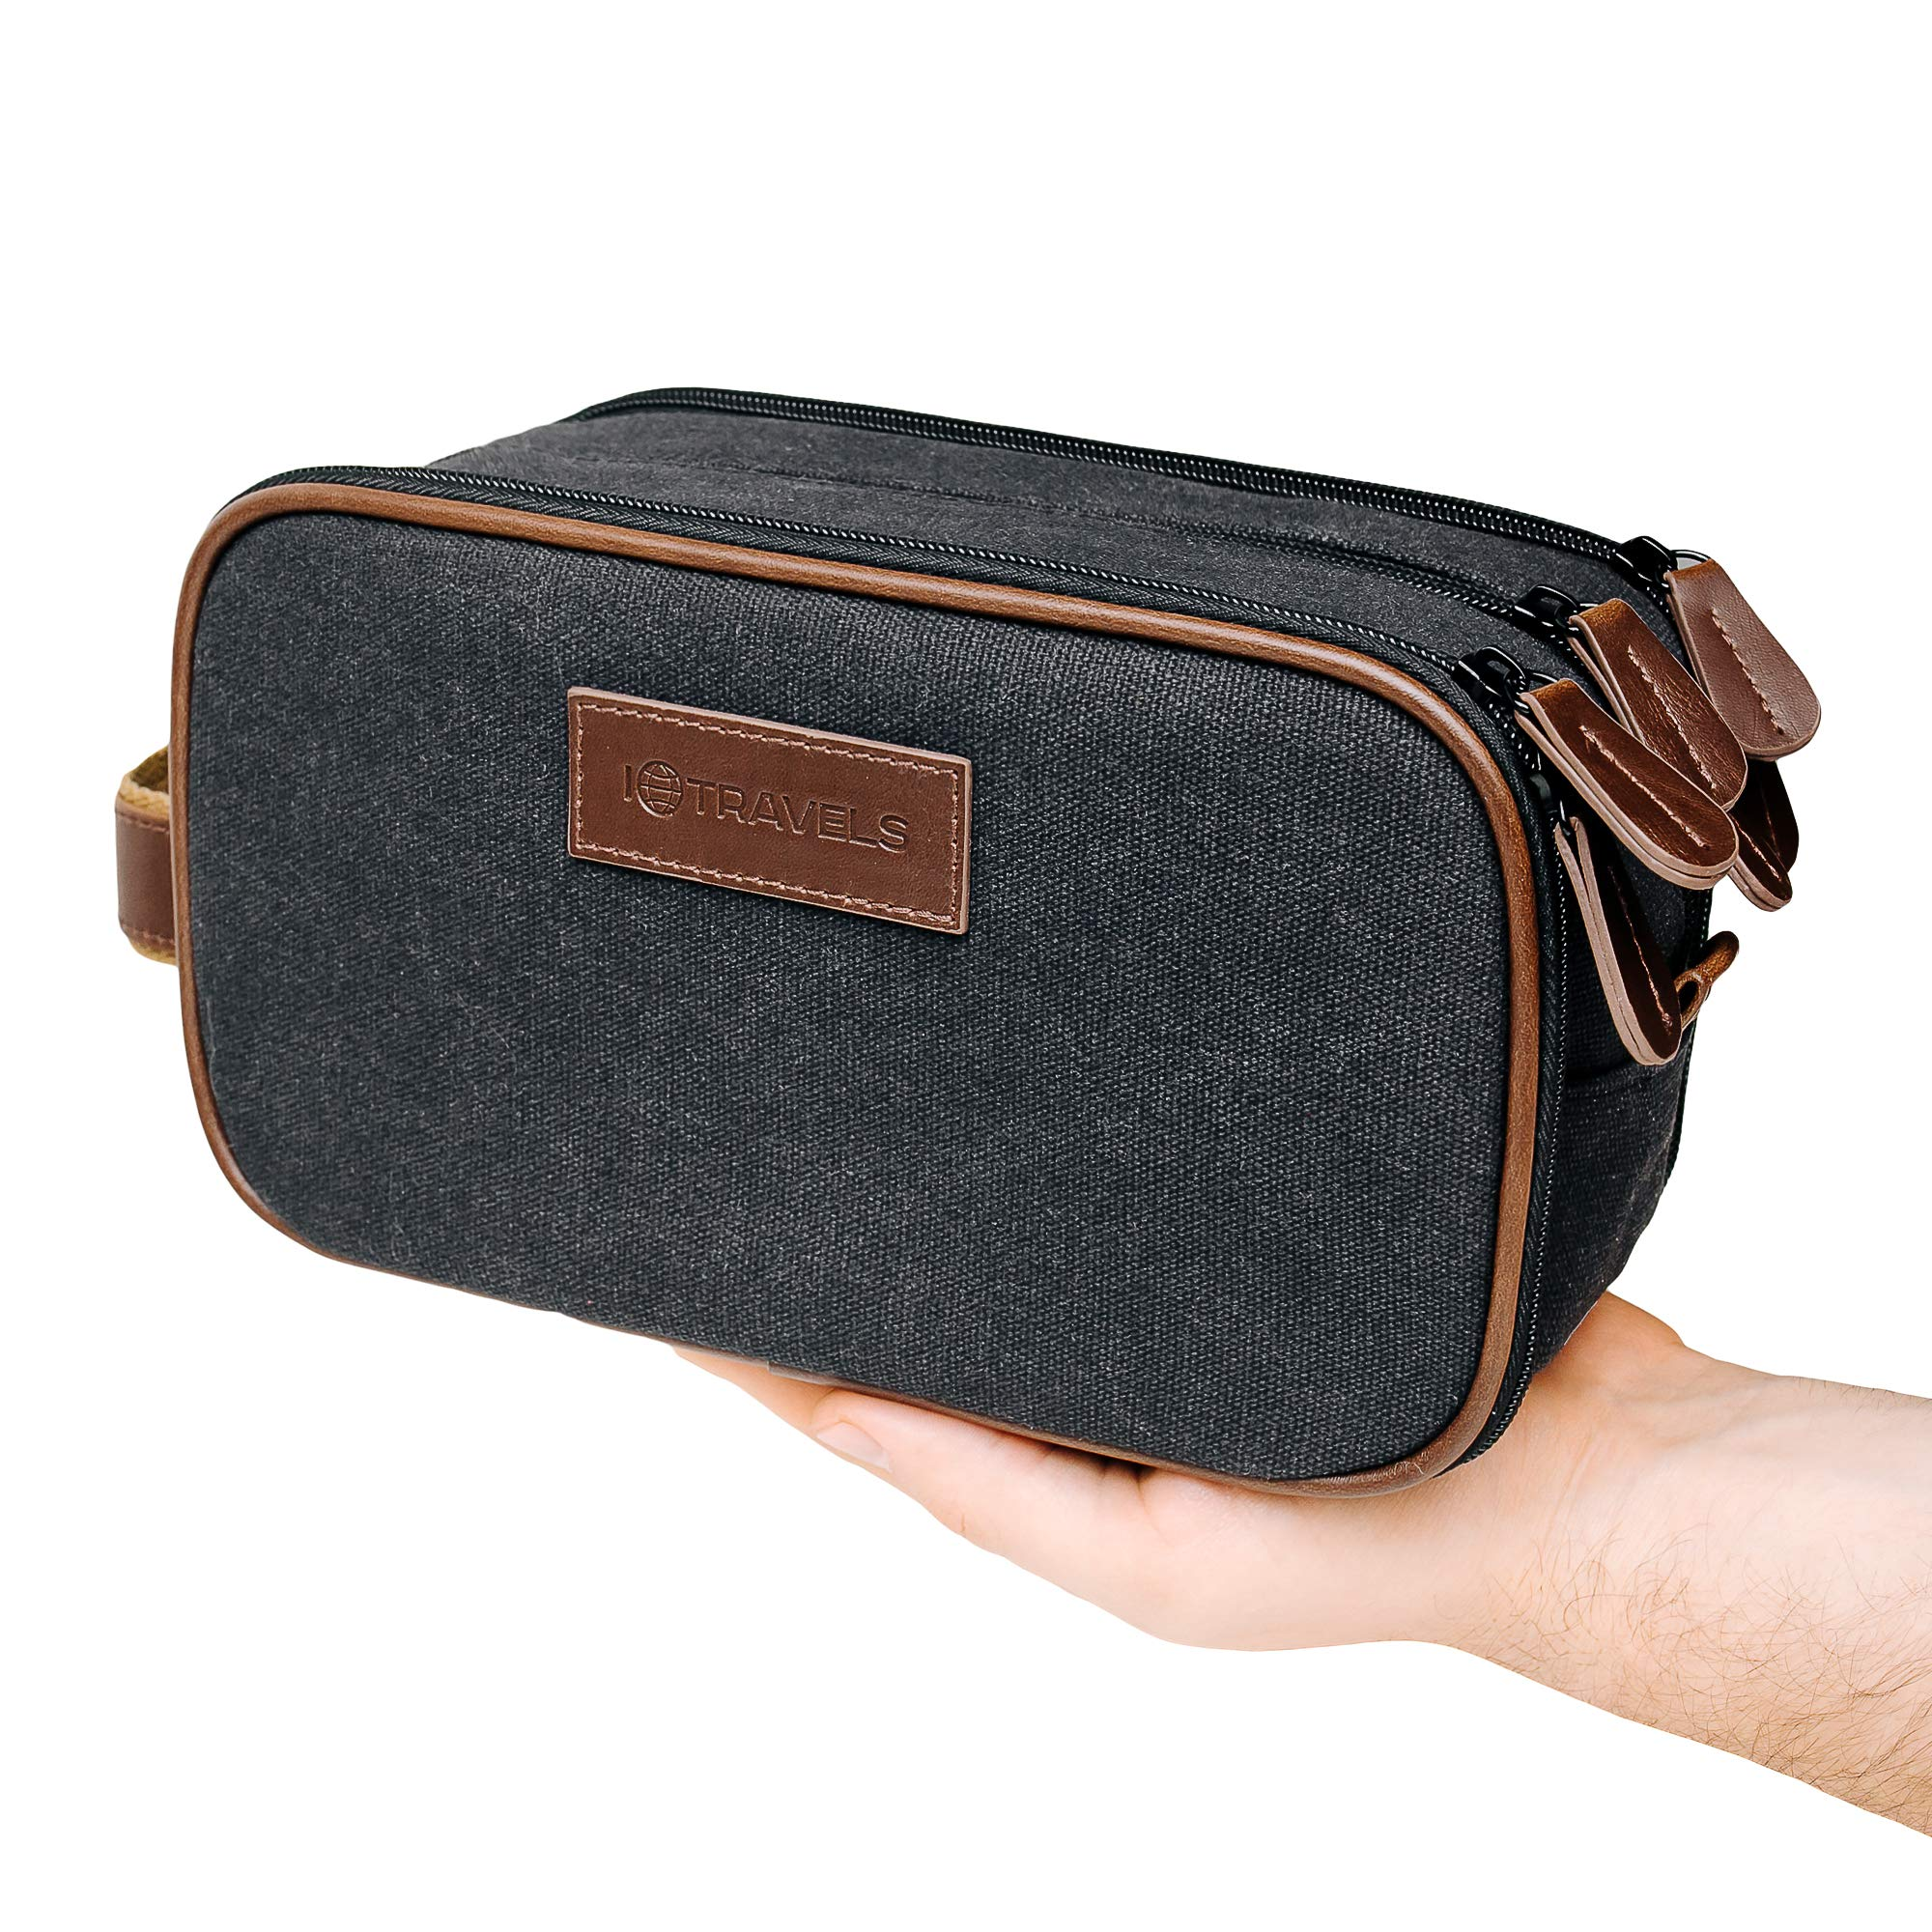 Travel Toiletry Bag - Mens Dopp kit - Hanging Cosmetic Organizer for Men | Large Portable Bathroom Accessories Kit | Hygiene Shaving bag | Diabetic Medicine Bag | Zippered Compartments, Mesh Pockets